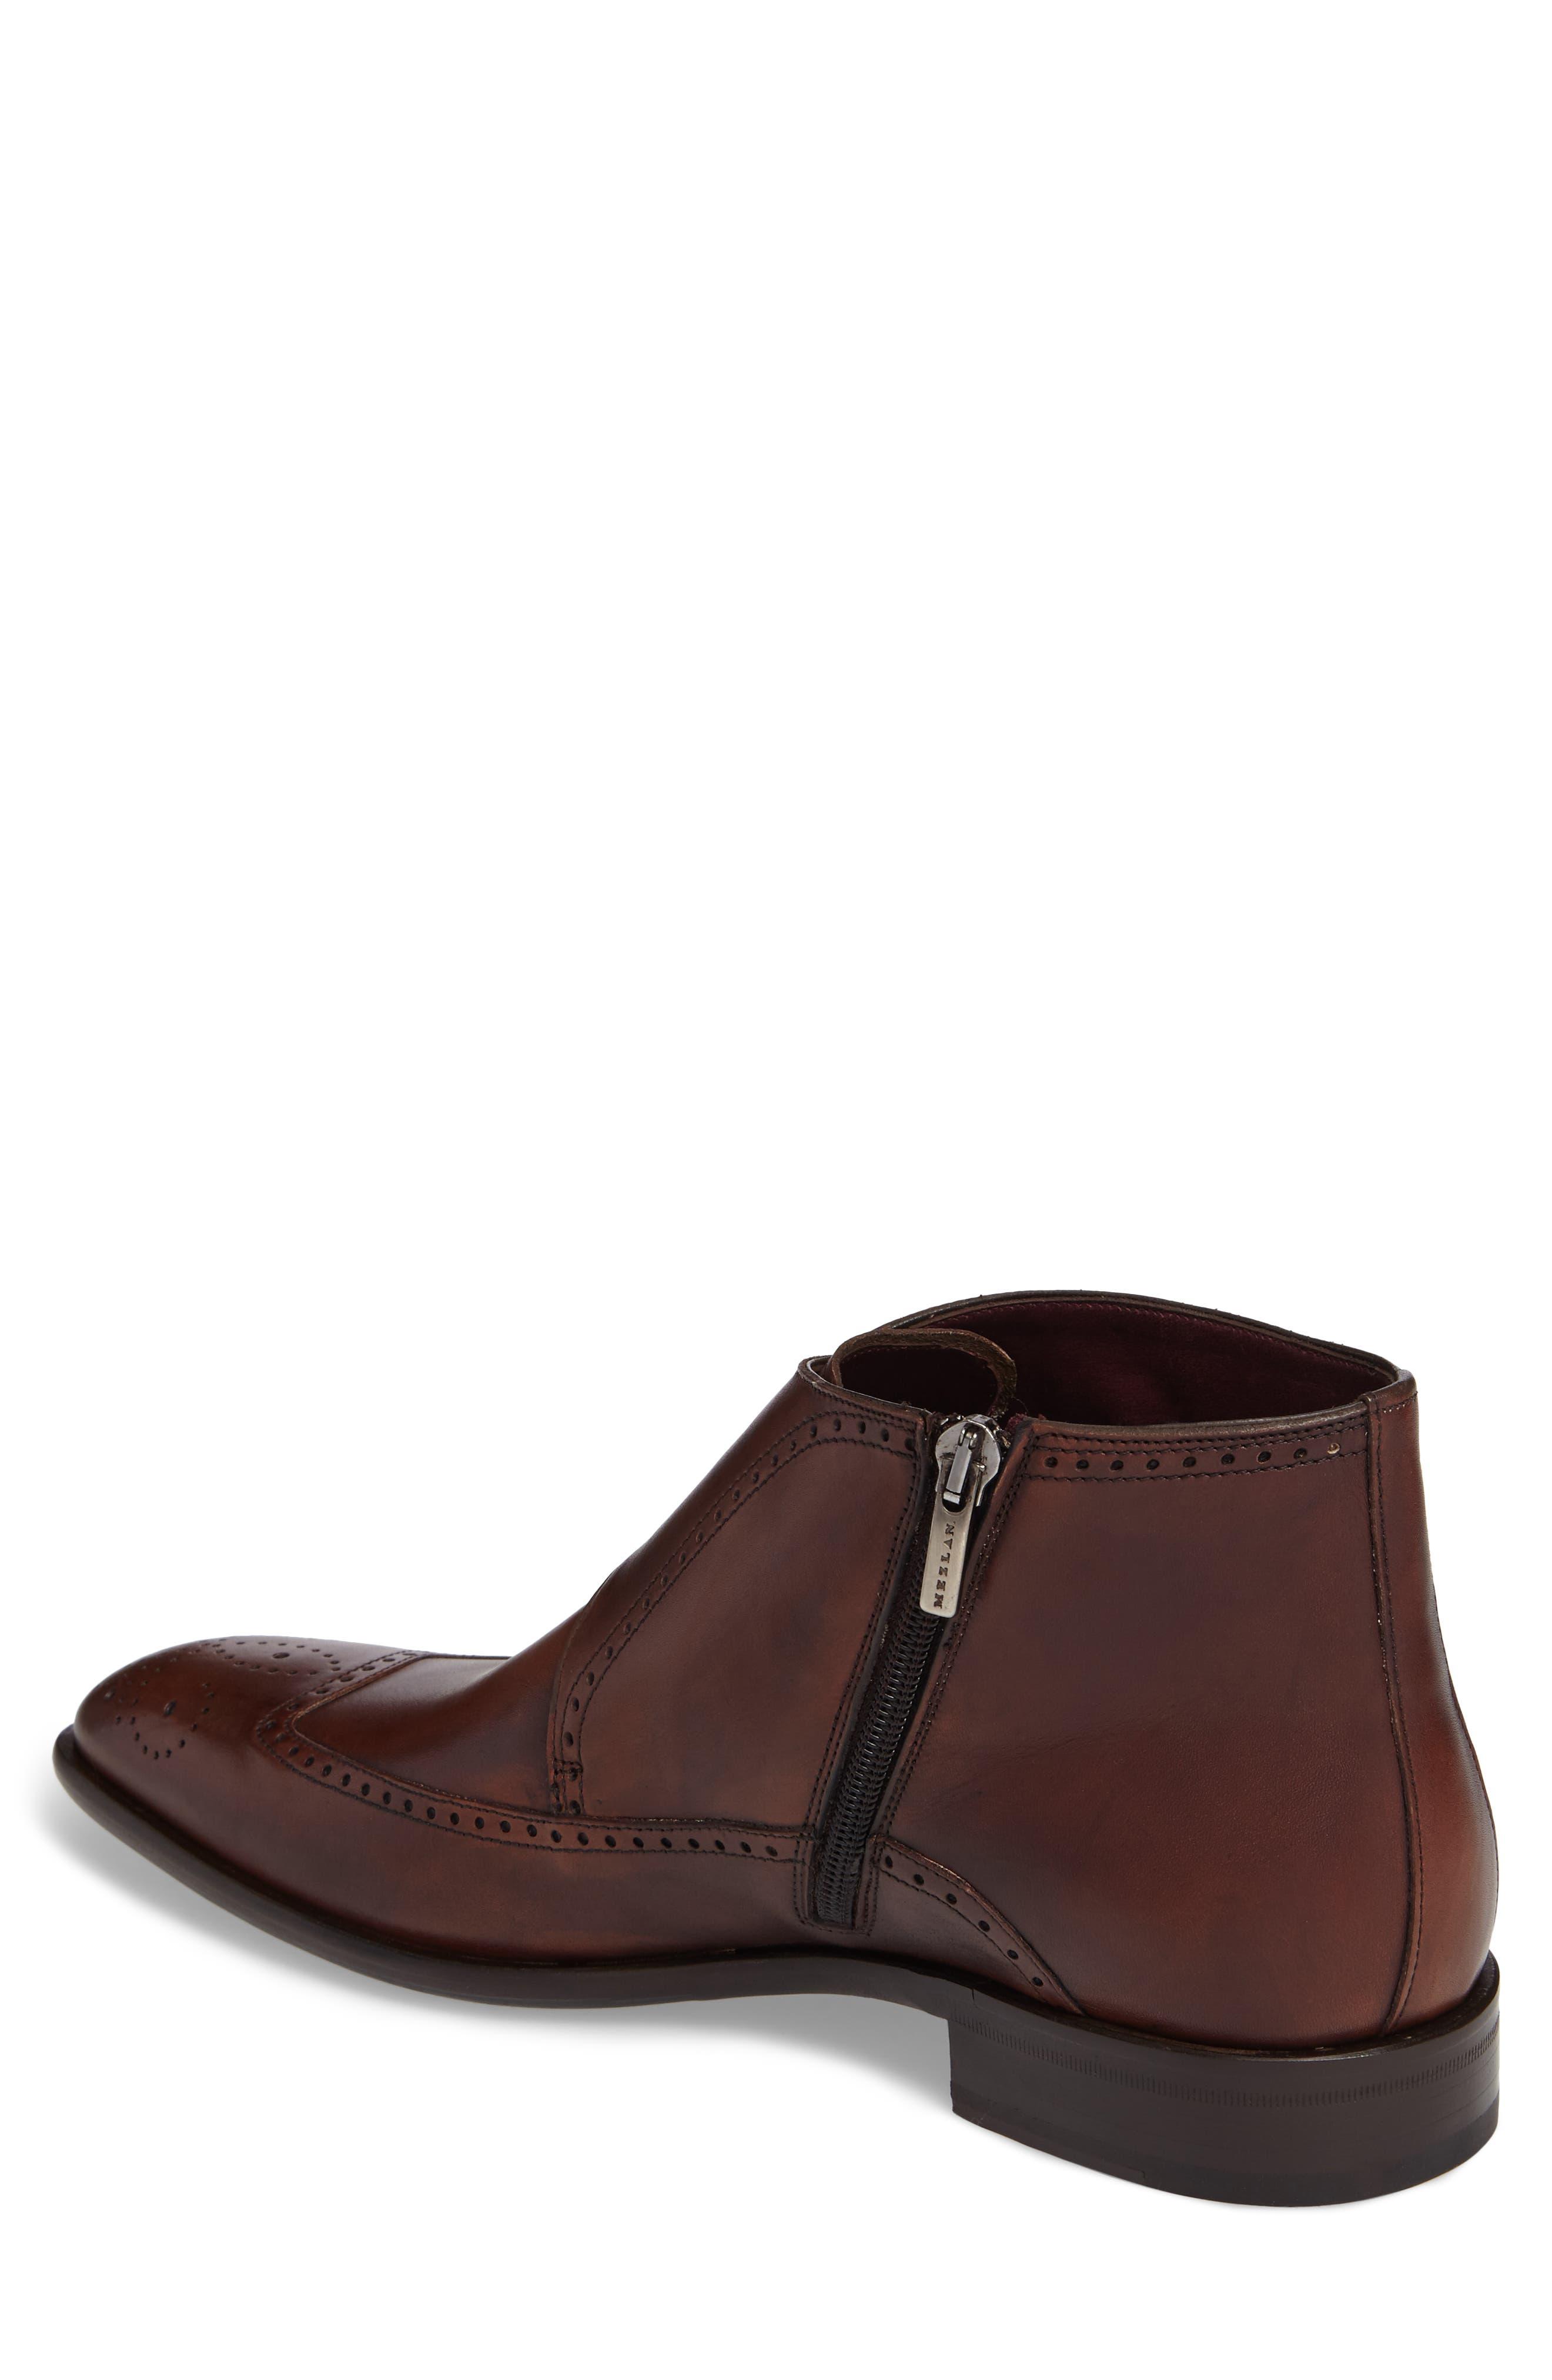 Alternate Image 2  - Mezlan Taberna Double Monk Strap Boot (Men)